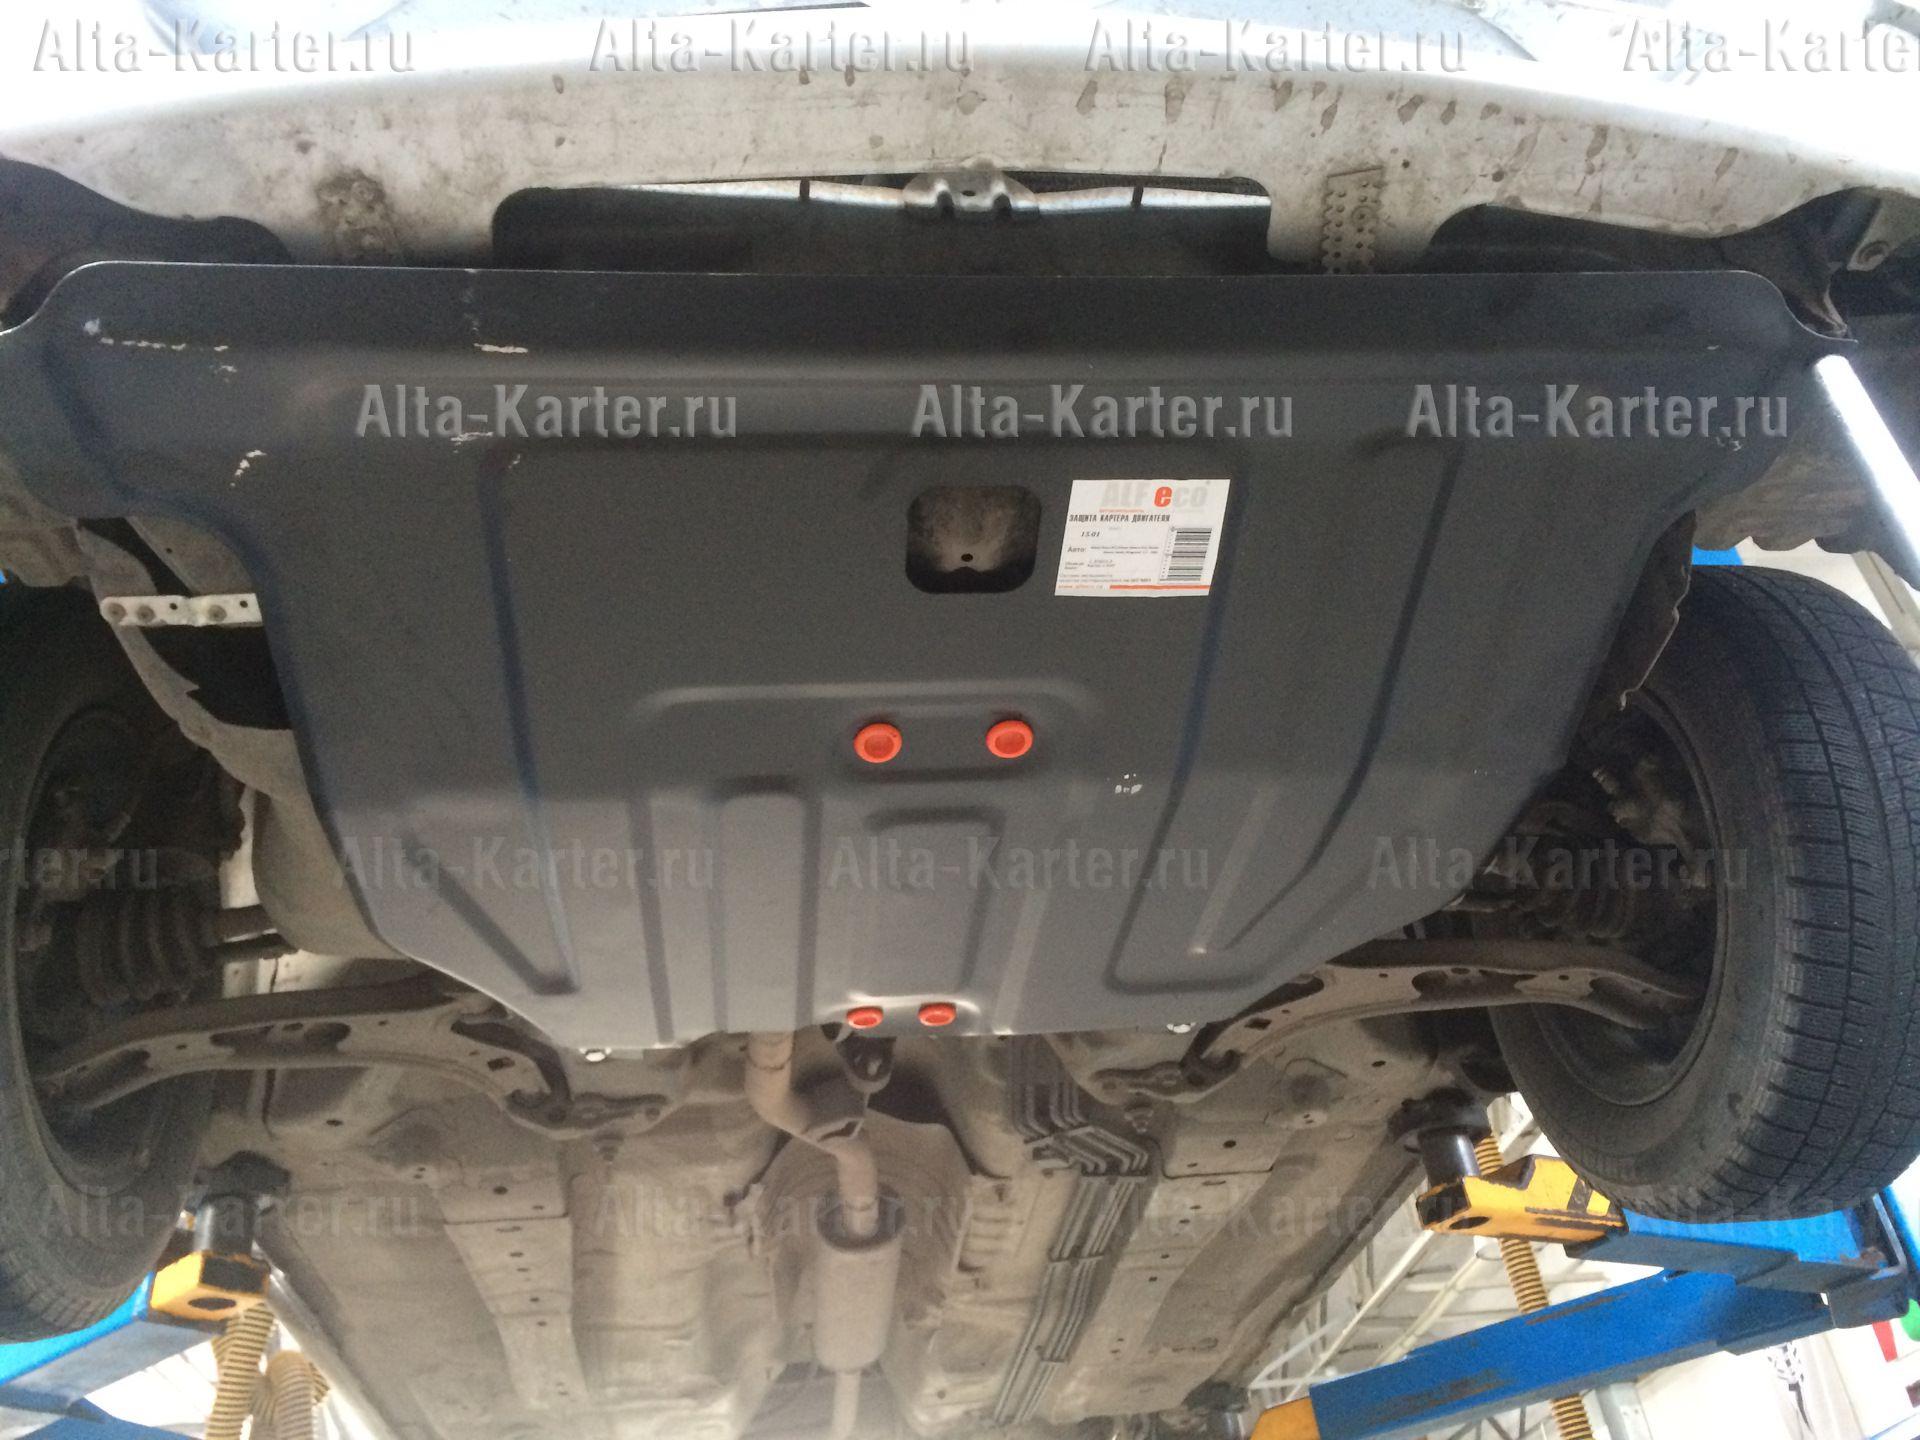 Защита Alfeco для картера и КПП Nissan Wingroad Y11 2WD 1999-2006. Артикул ALF.15.01